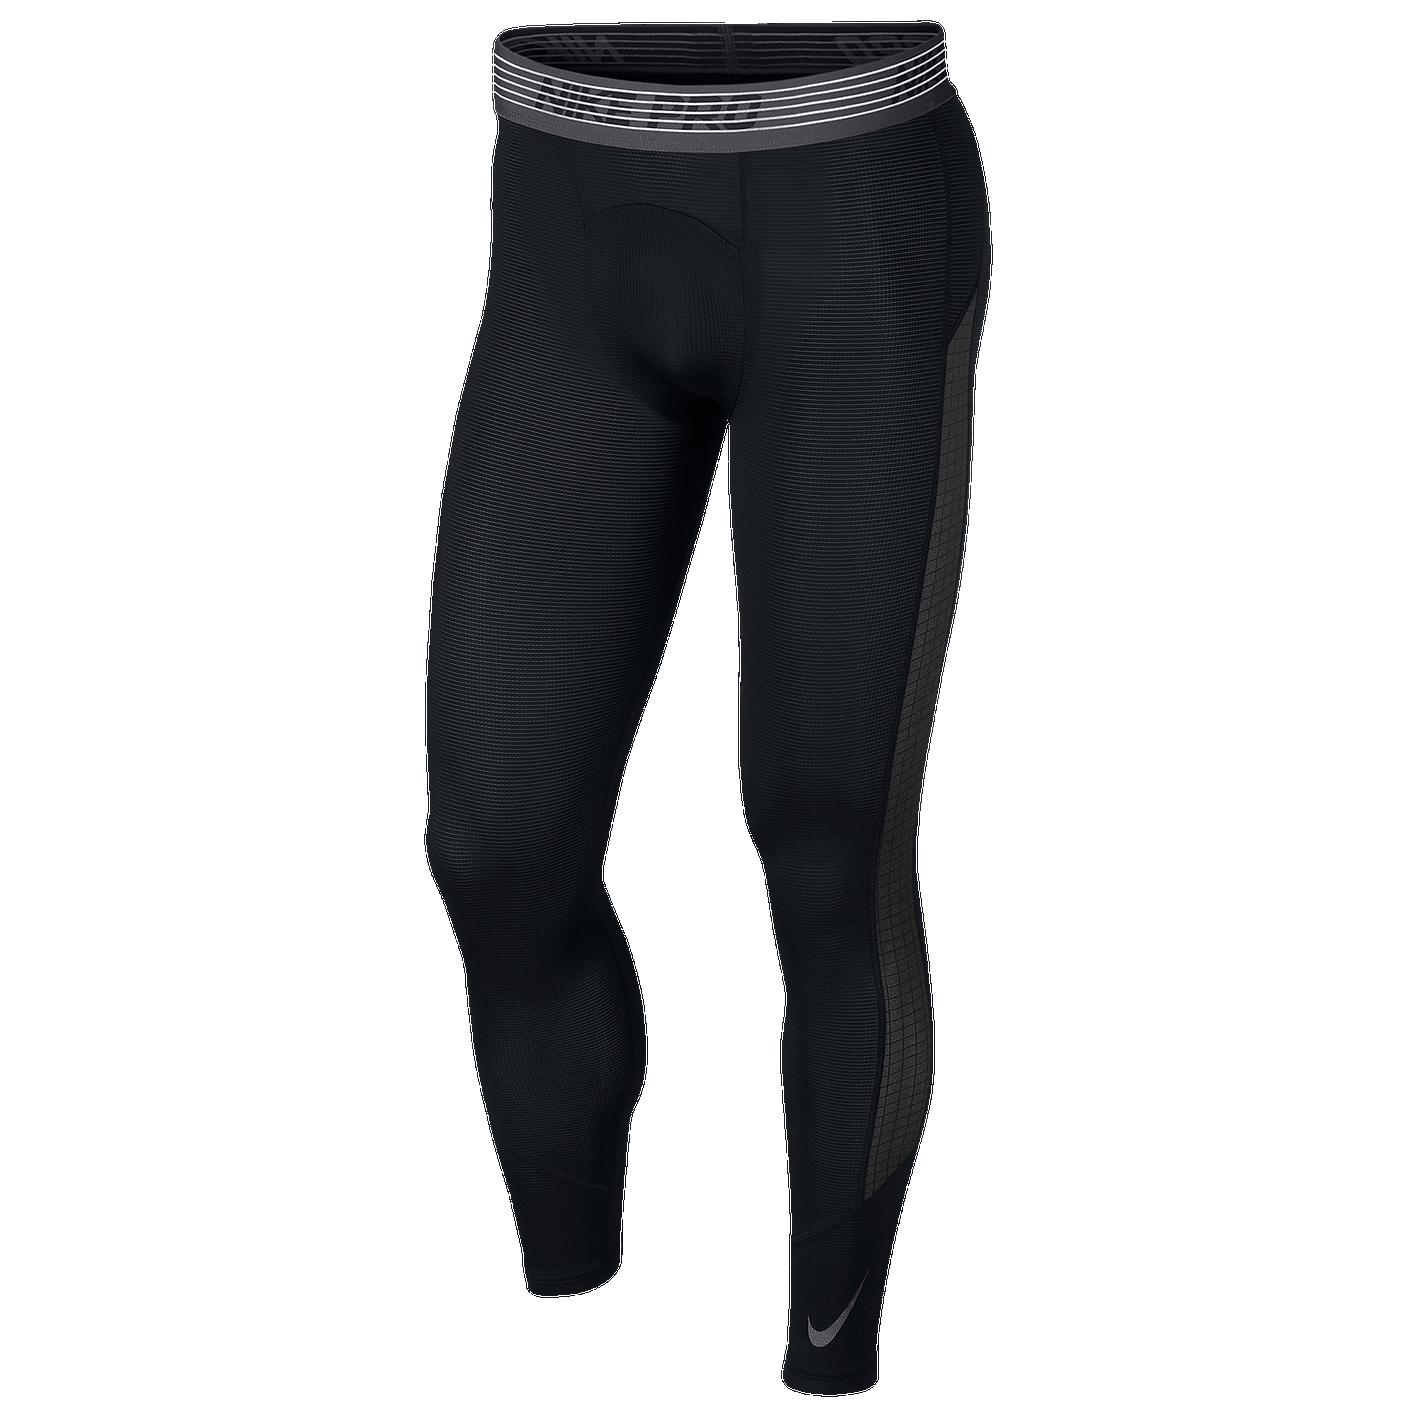 f4b2956ebf966 Nike Pro Breathe Compression Tights - Men's - Training - Clothing ...